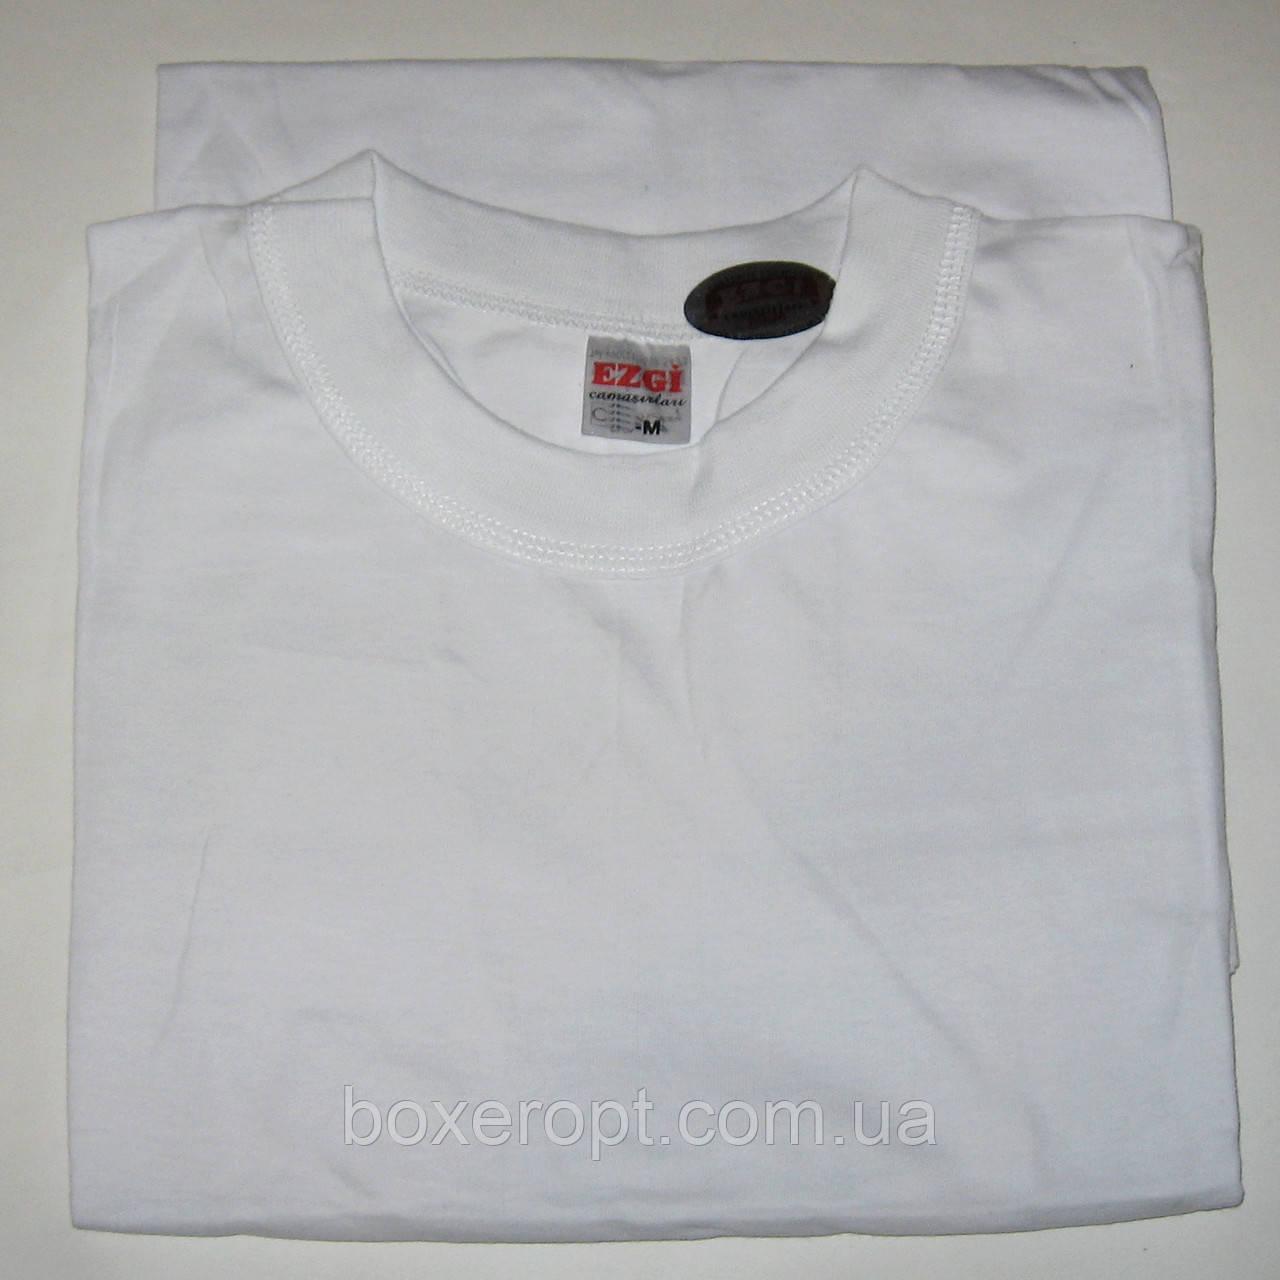 Мужские футболки Ezgi - 37.00 грн./шт. (54-й размер, белые)